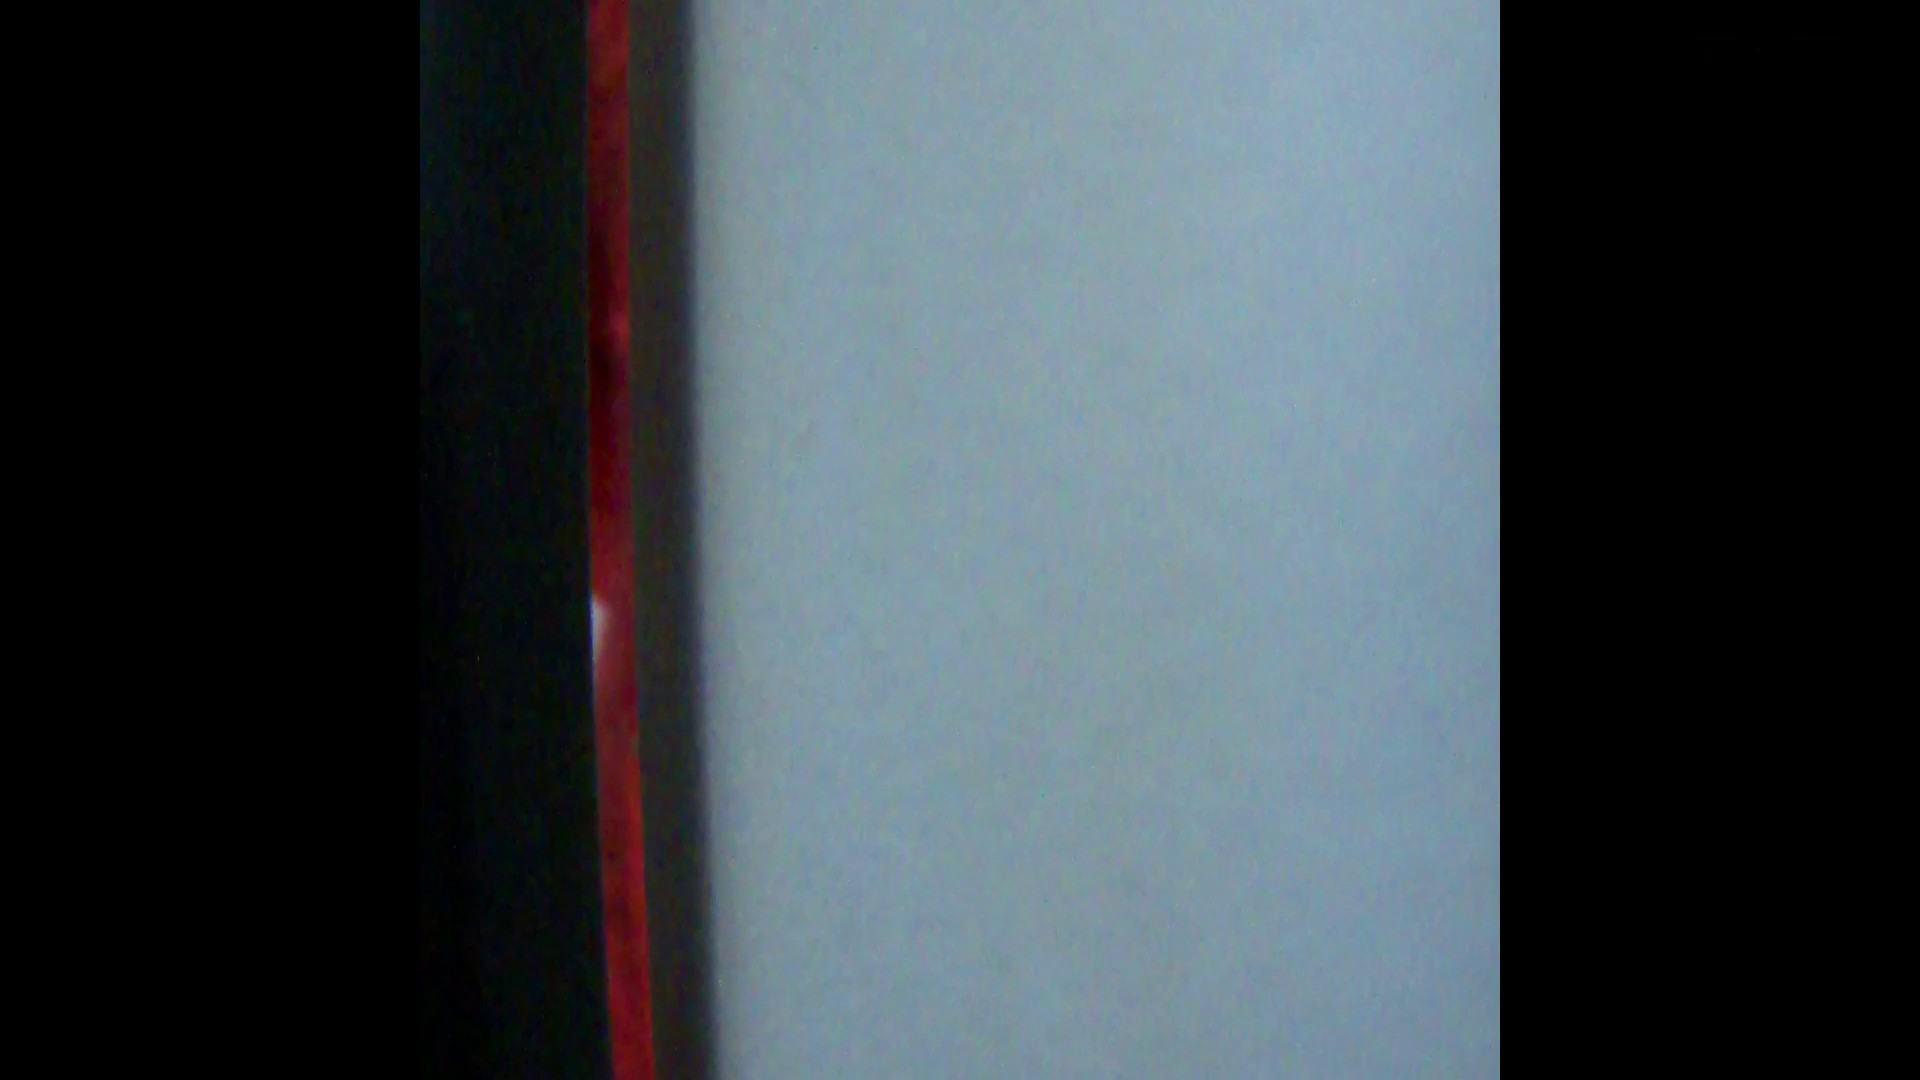 JD盗撮 美女の洗面所の秘密 Vol.78 トイレで・・・ ワレメ動画紹介 89画像 9